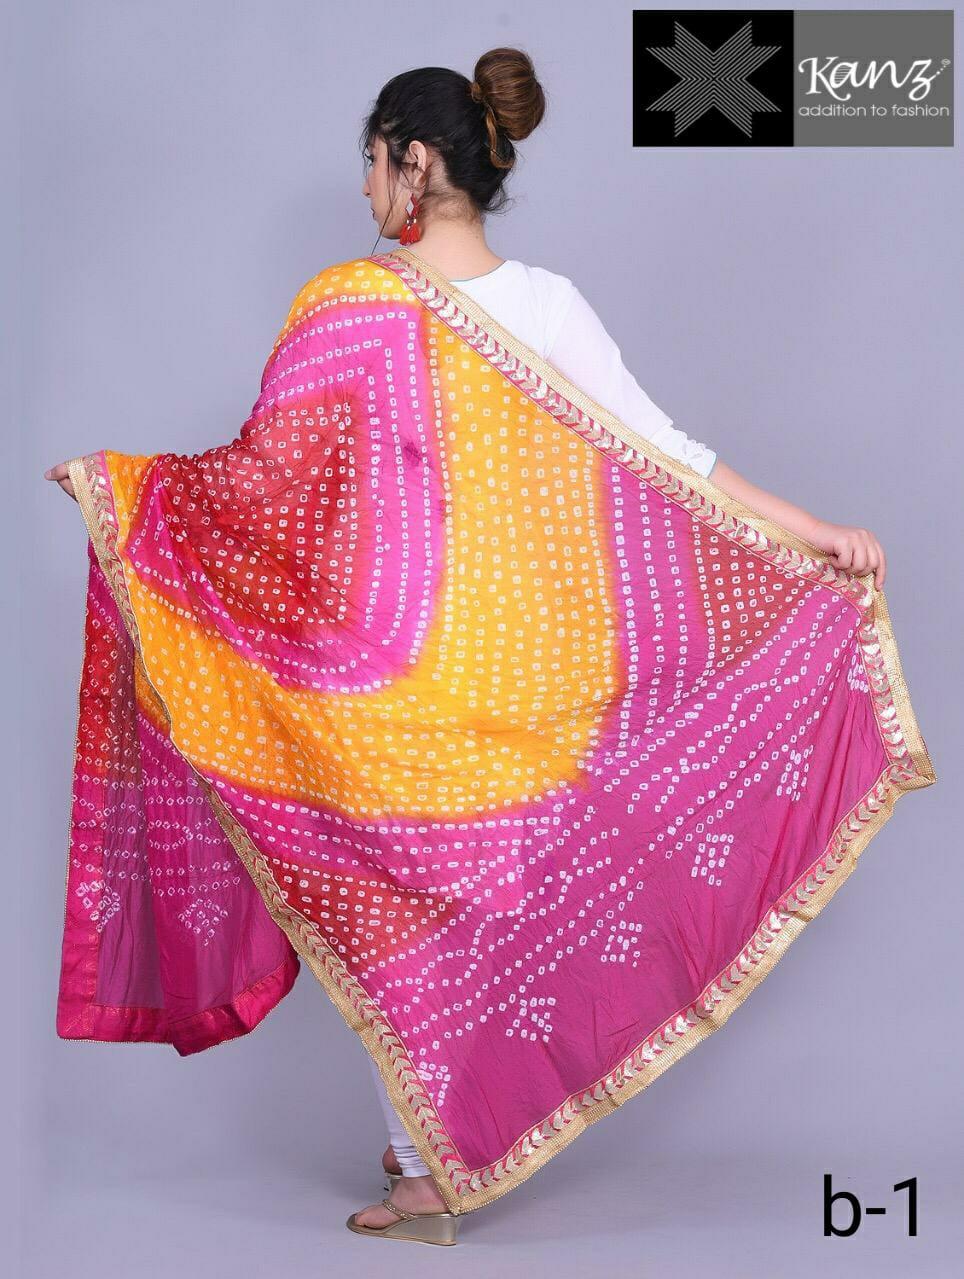 Kanz Scarf Bandhej Dupatta With Gotapatti Lace Border Festive Collection